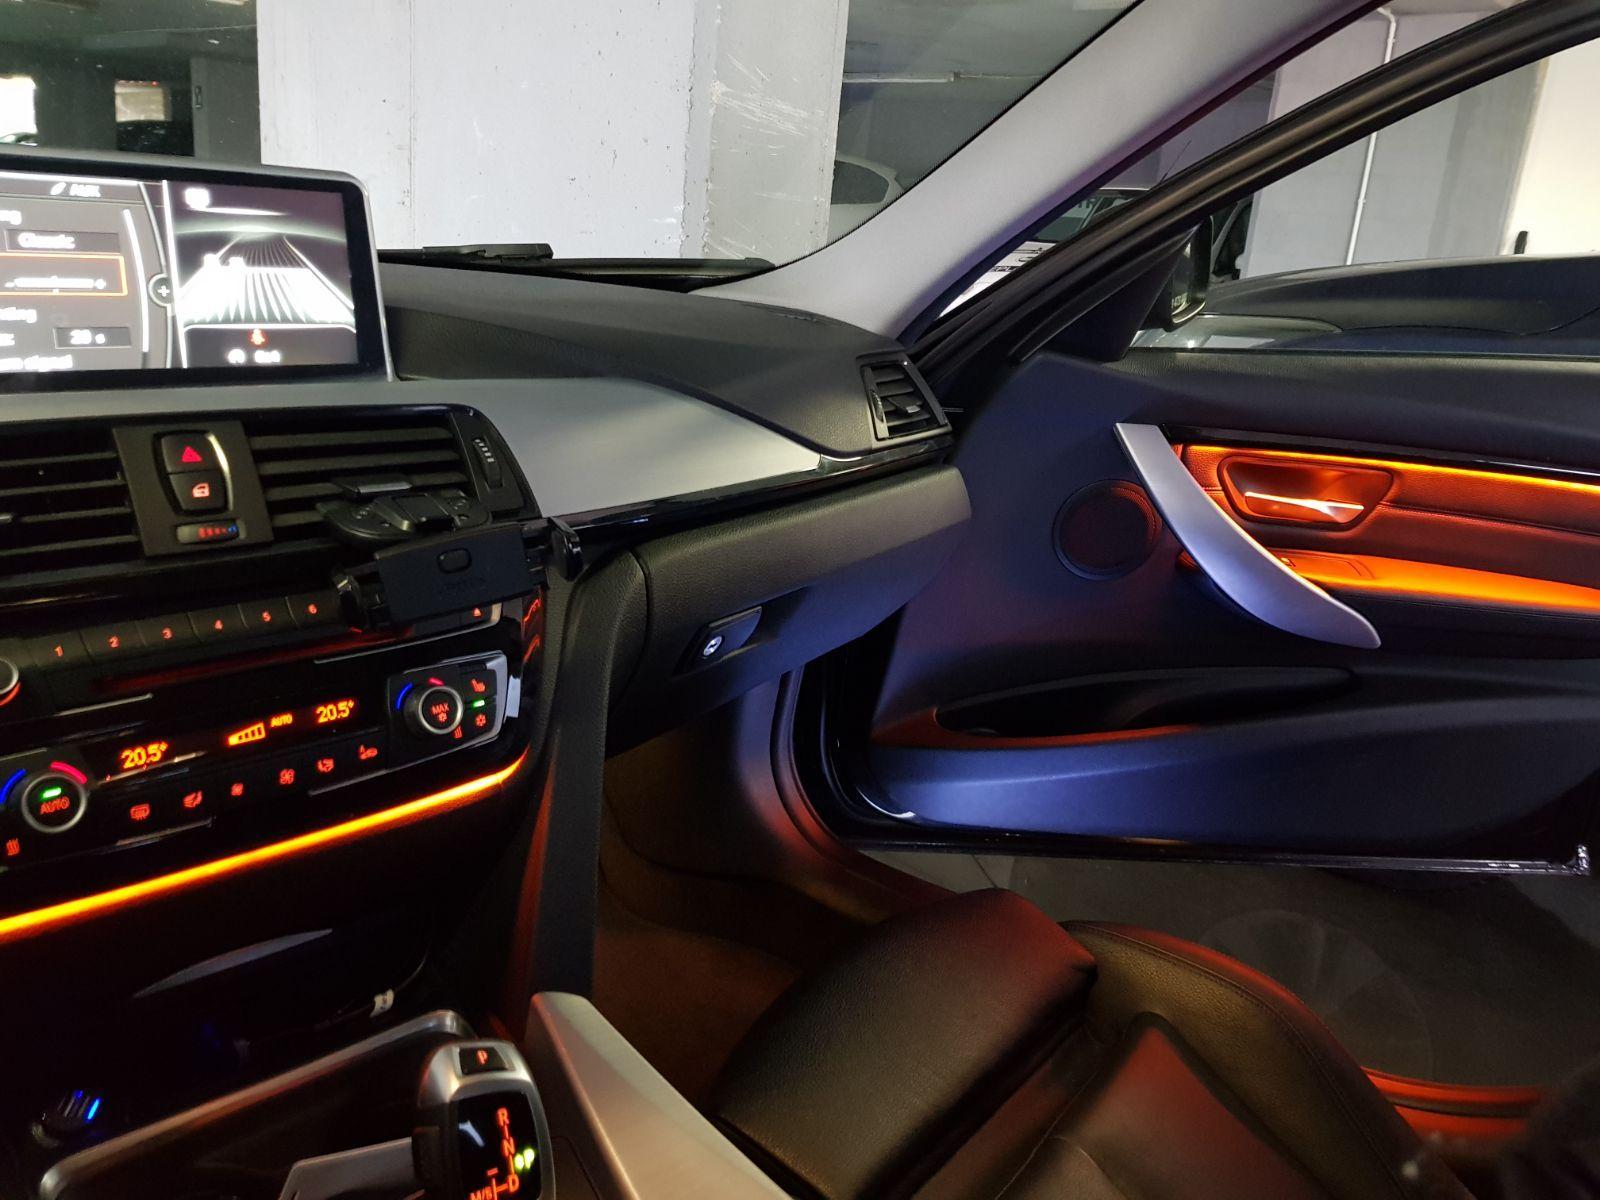 high quality after market bmw f30 interior door panel decorative trim led ambient lights lighting upgrade by retrofit kits  [ 1600 x 1200 Pixel ]